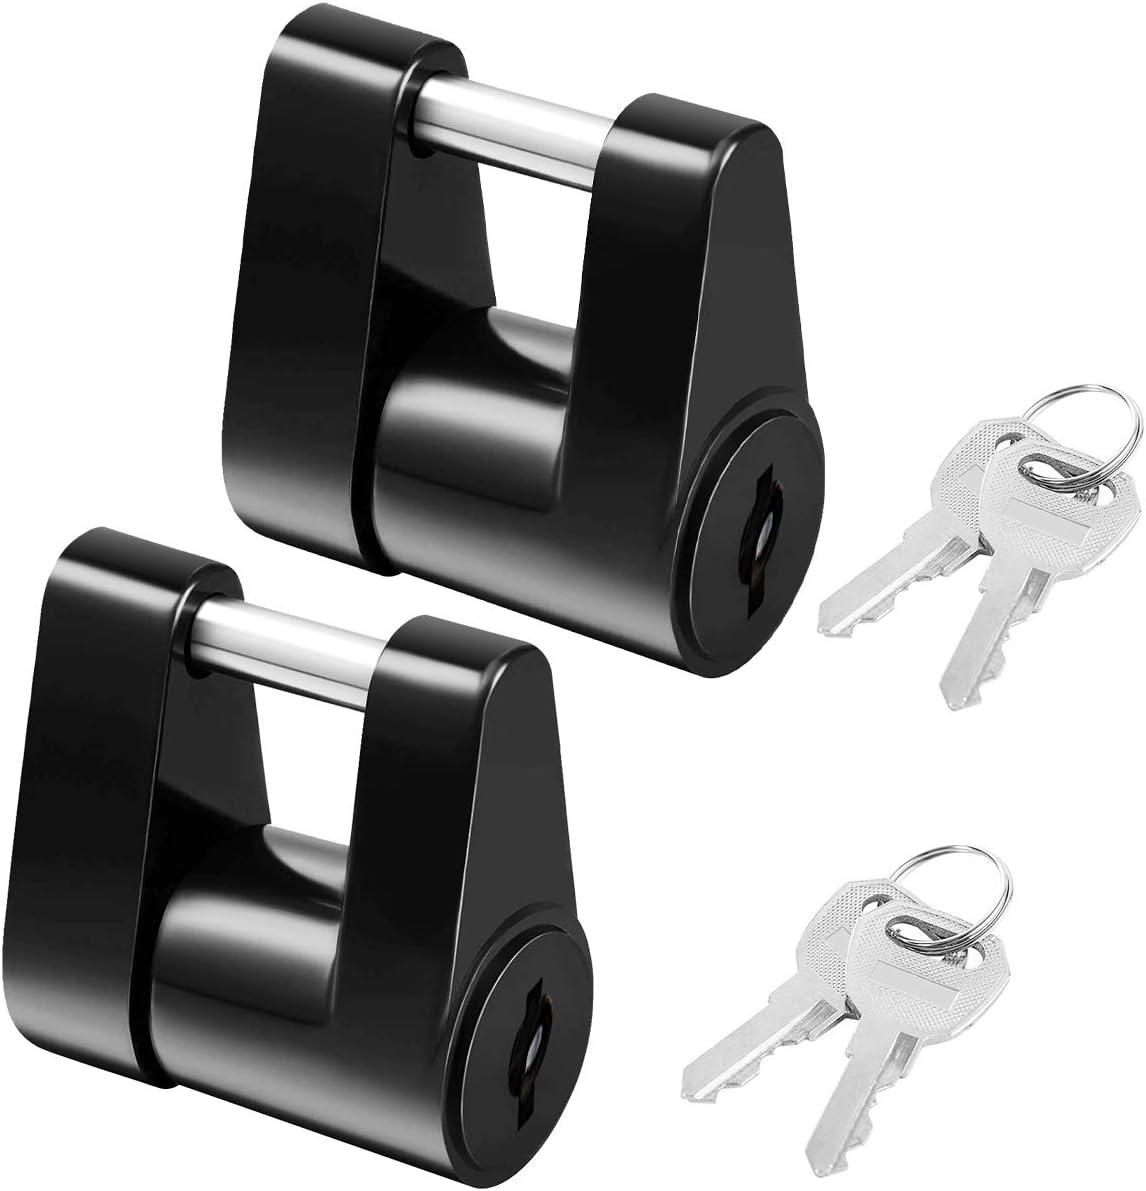 LCGP 2PCS Black Trailer Hitch Coupler Locks Dia 1//4 Inch 3//4 Inch Span Boat RV Truck Cars Coupler